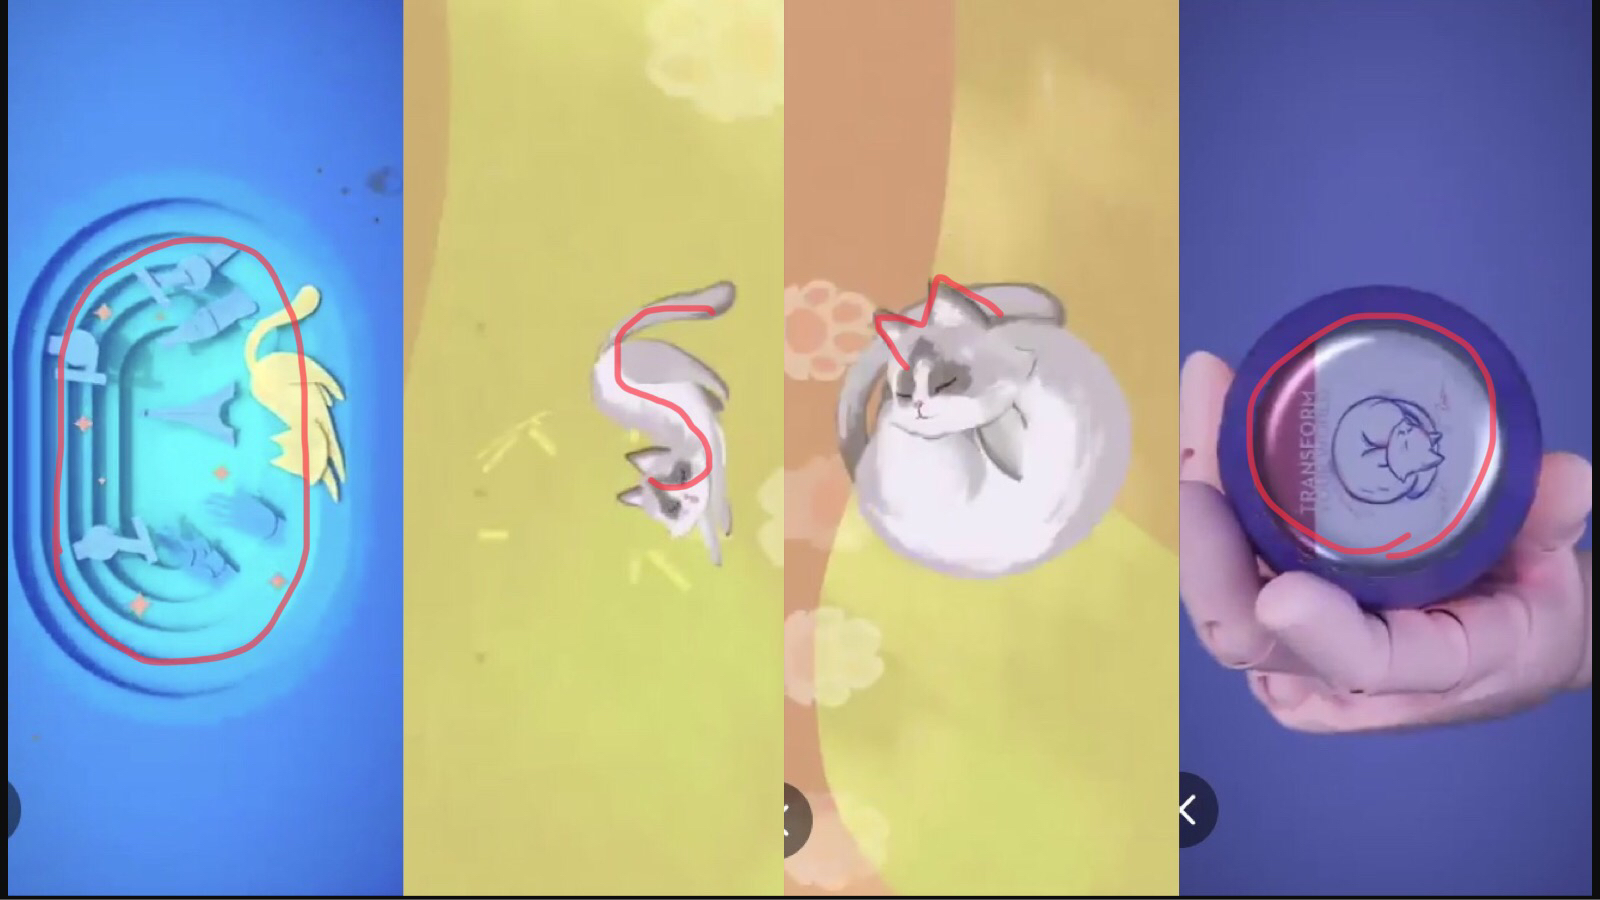 "DJI新製品発表は「Osmo Mobile 3」で確定?グリップ折りたたみ。「""カタチ変わる"" 」「""Transform"" Your World」DJI考察/予想/最新情報 2019年8月"